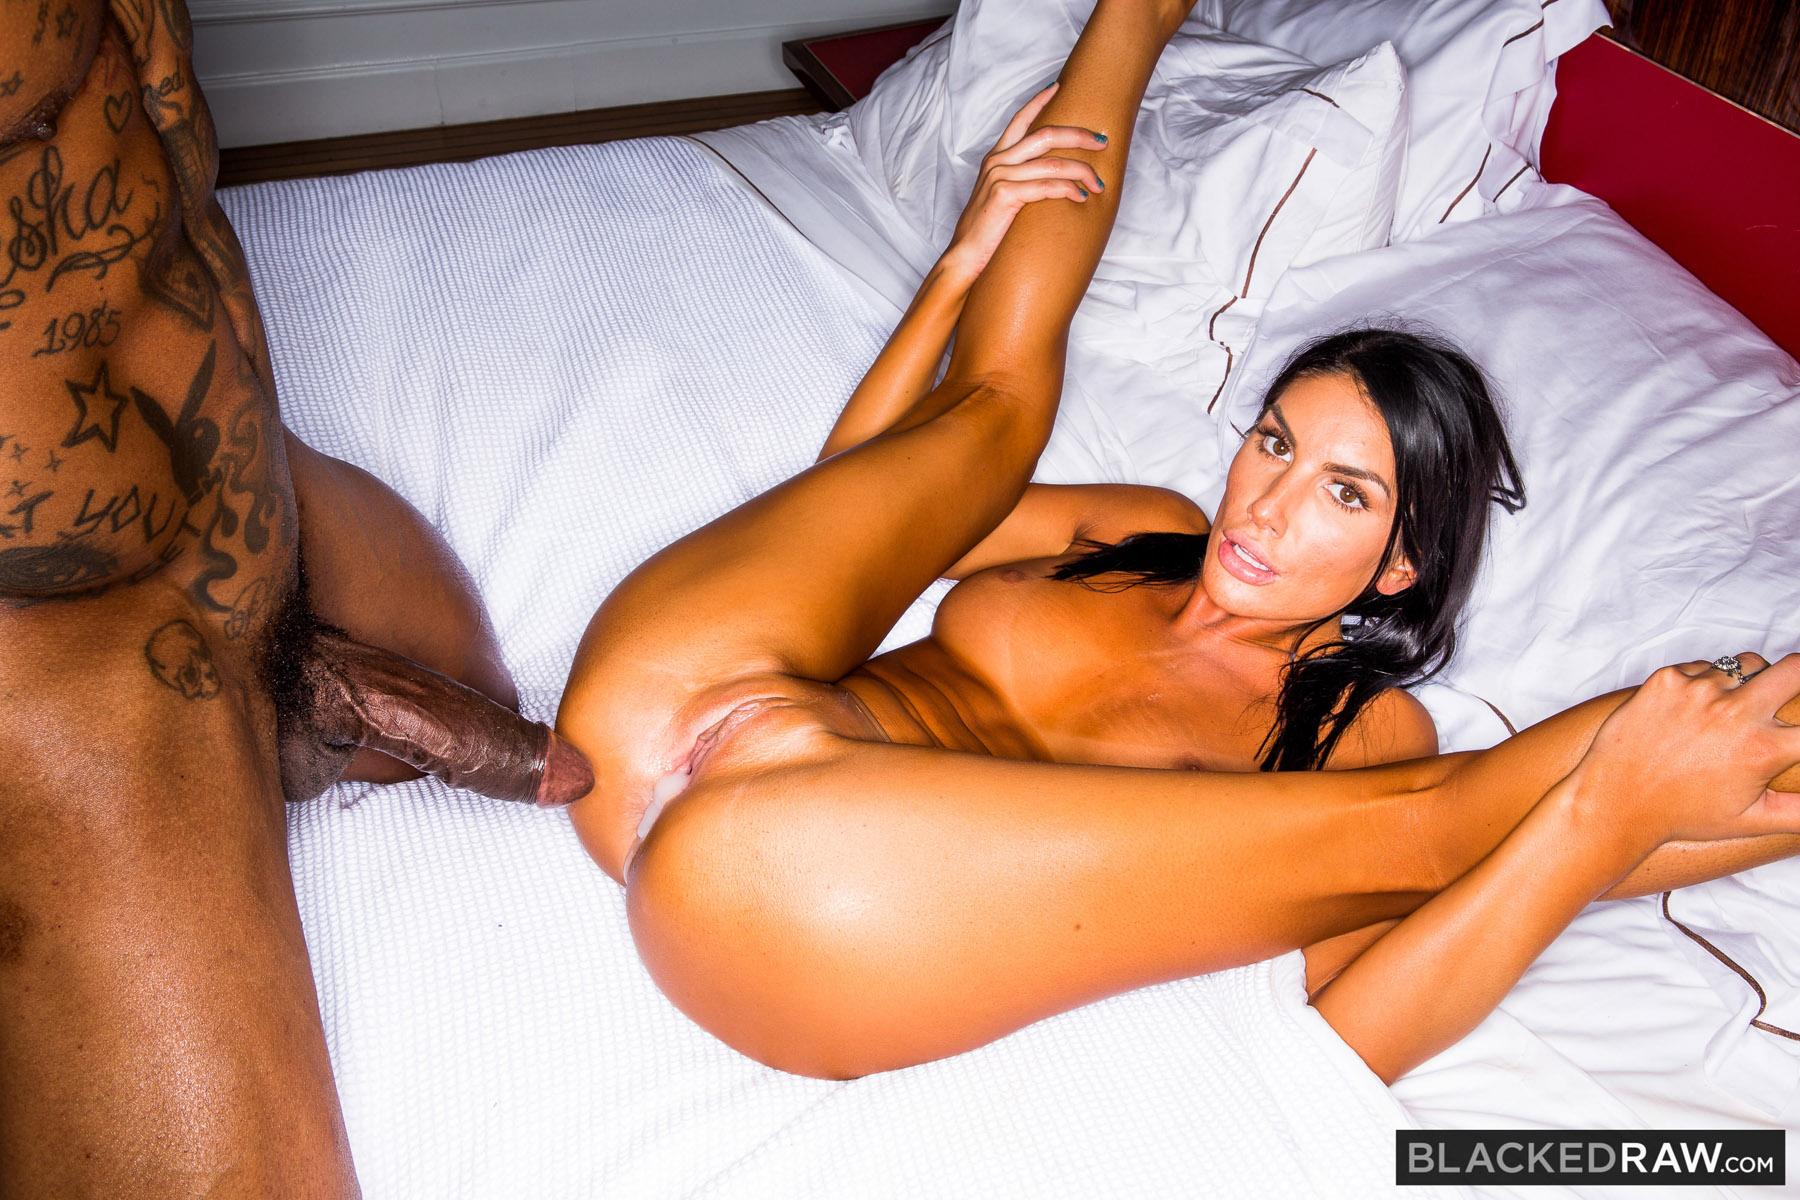 pussy-sex-black-magic-pic-milf-cougar-blowjob